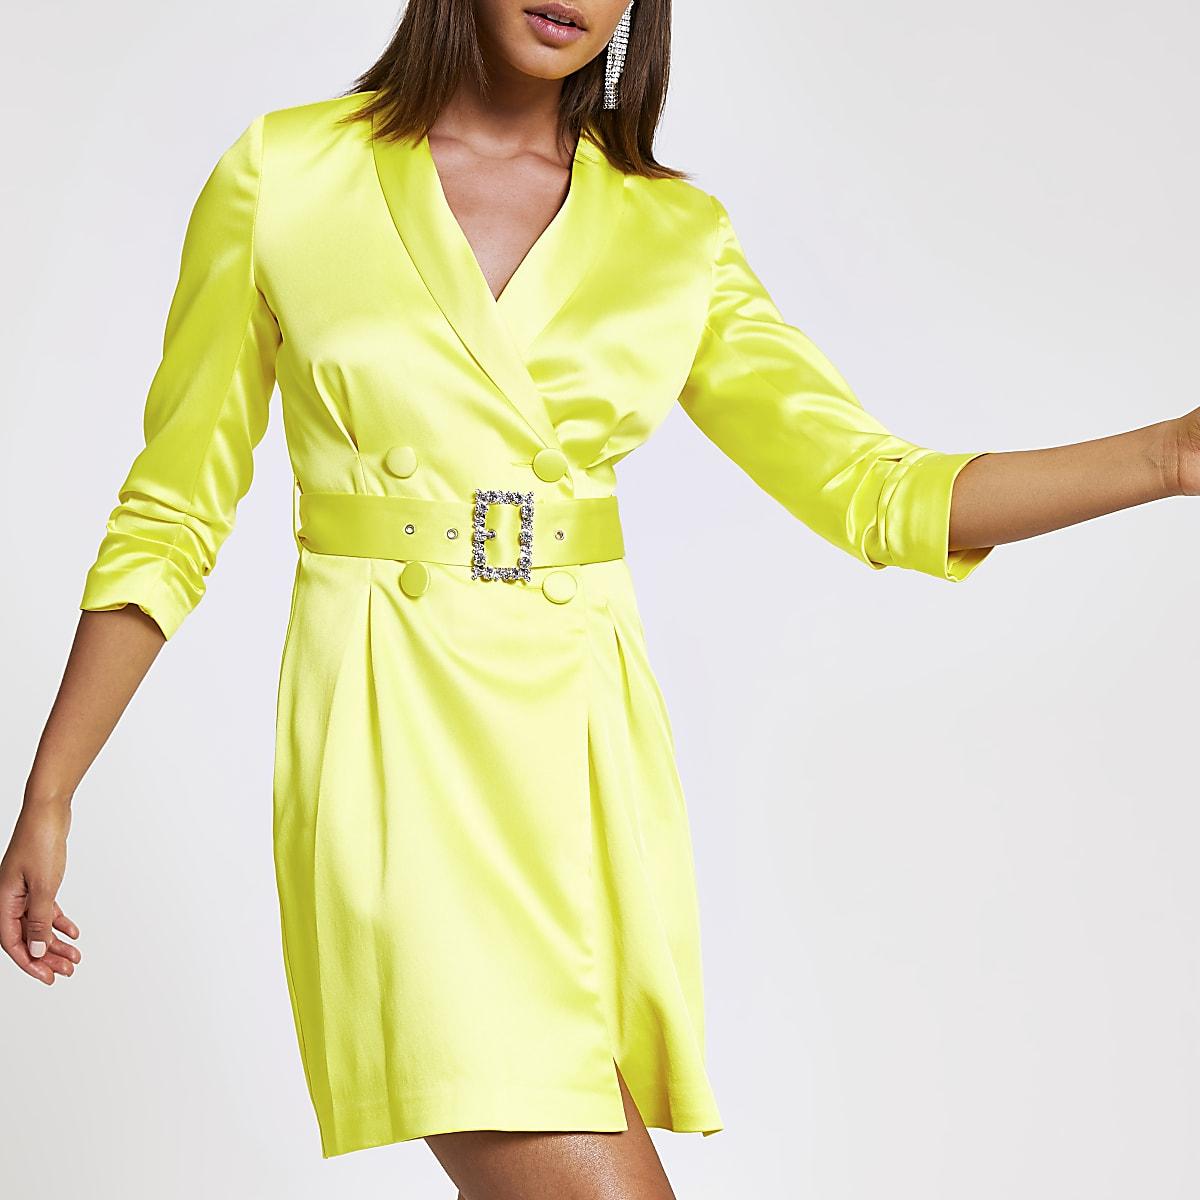 Yellow belted blazer dress